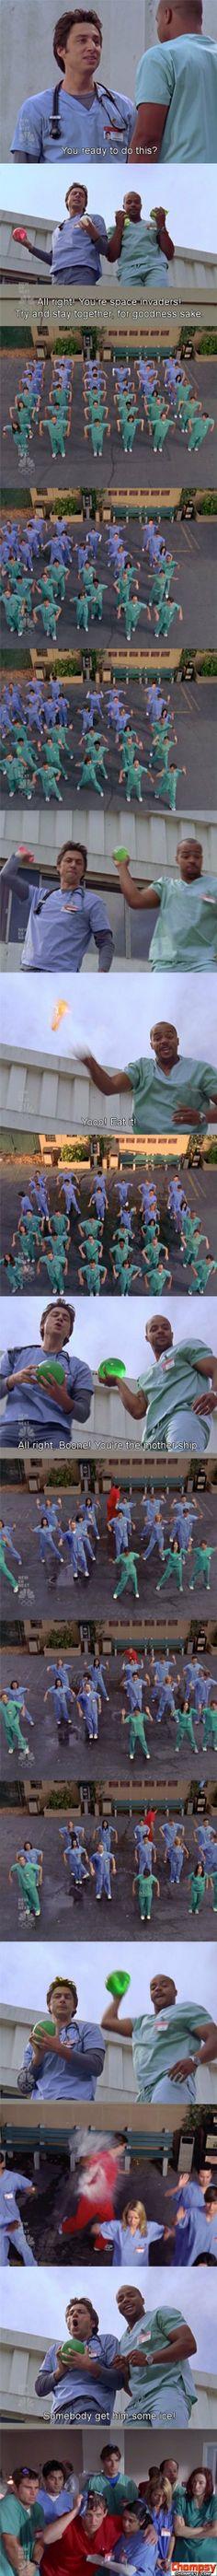 scrubs space invaders